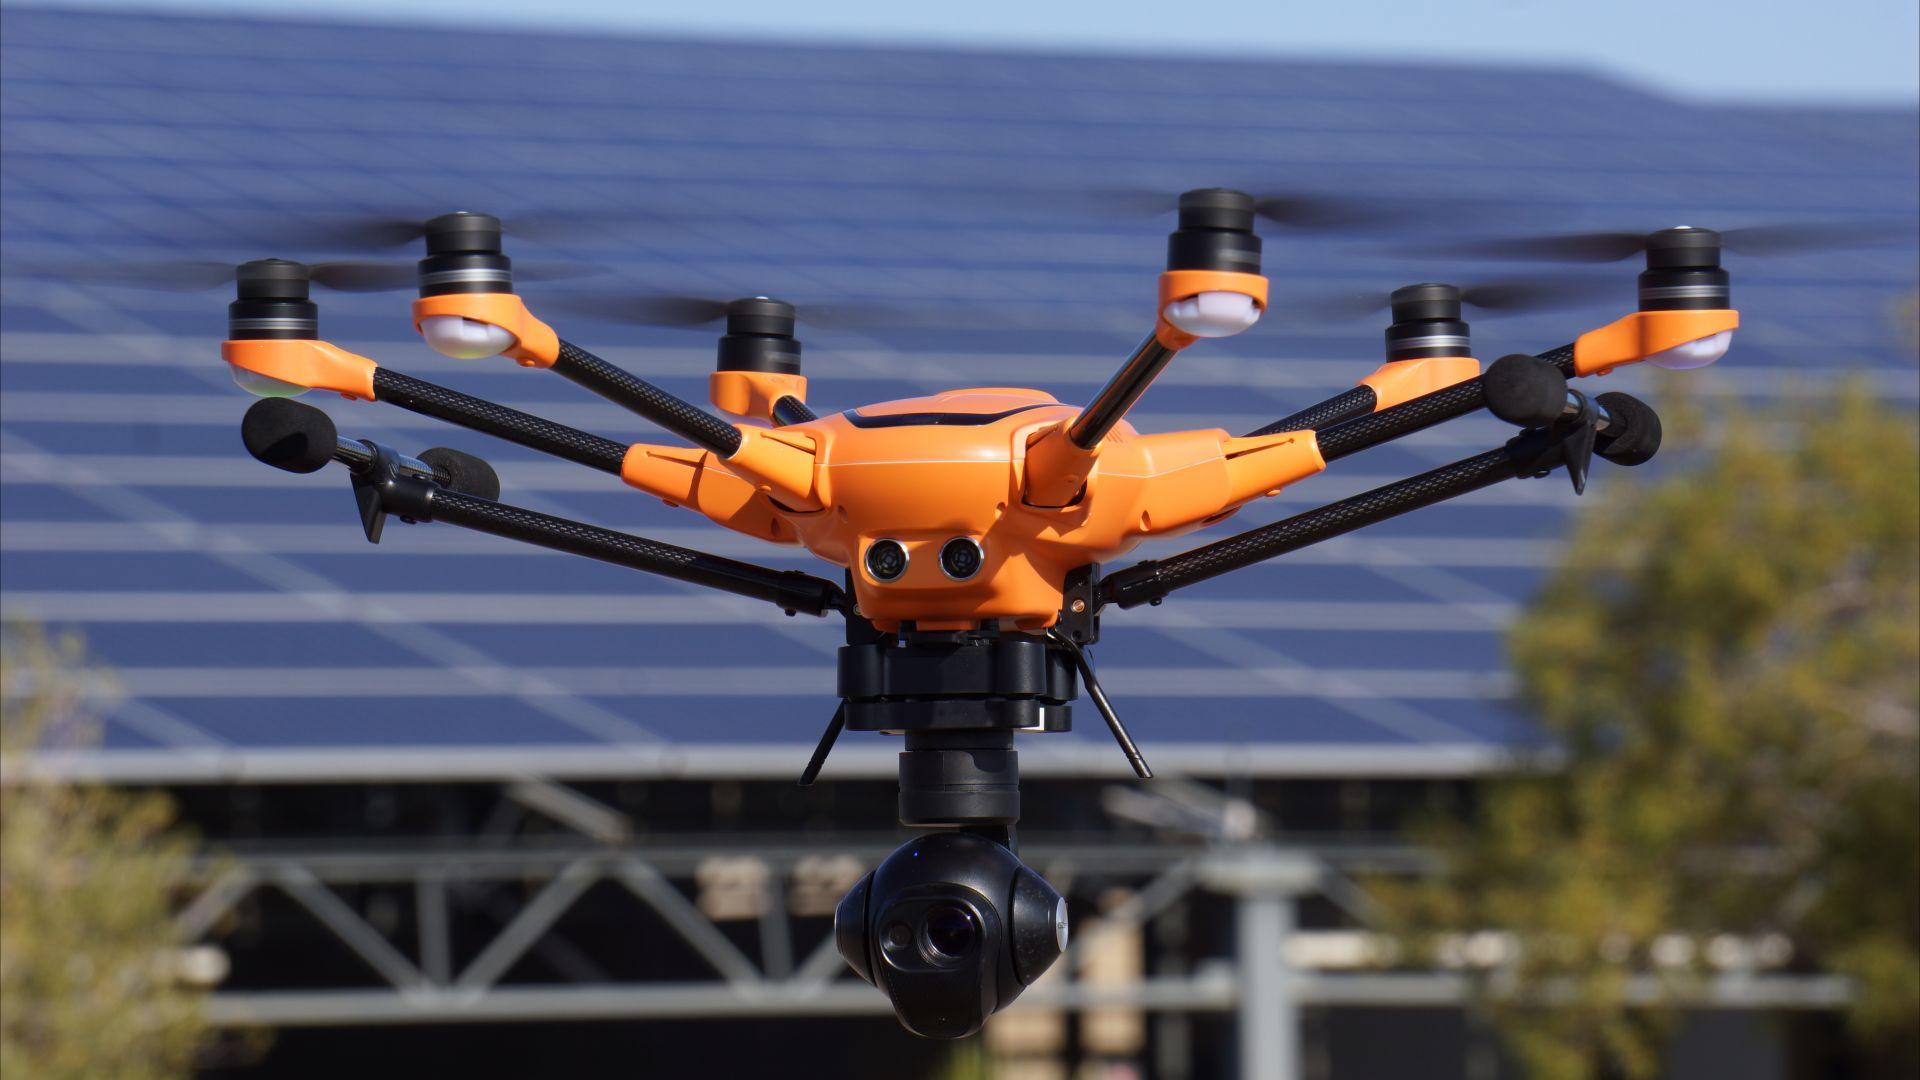 Best Dji Drone >> Wallpaper Yuneec H520, best drones, Hi-Tech #13066